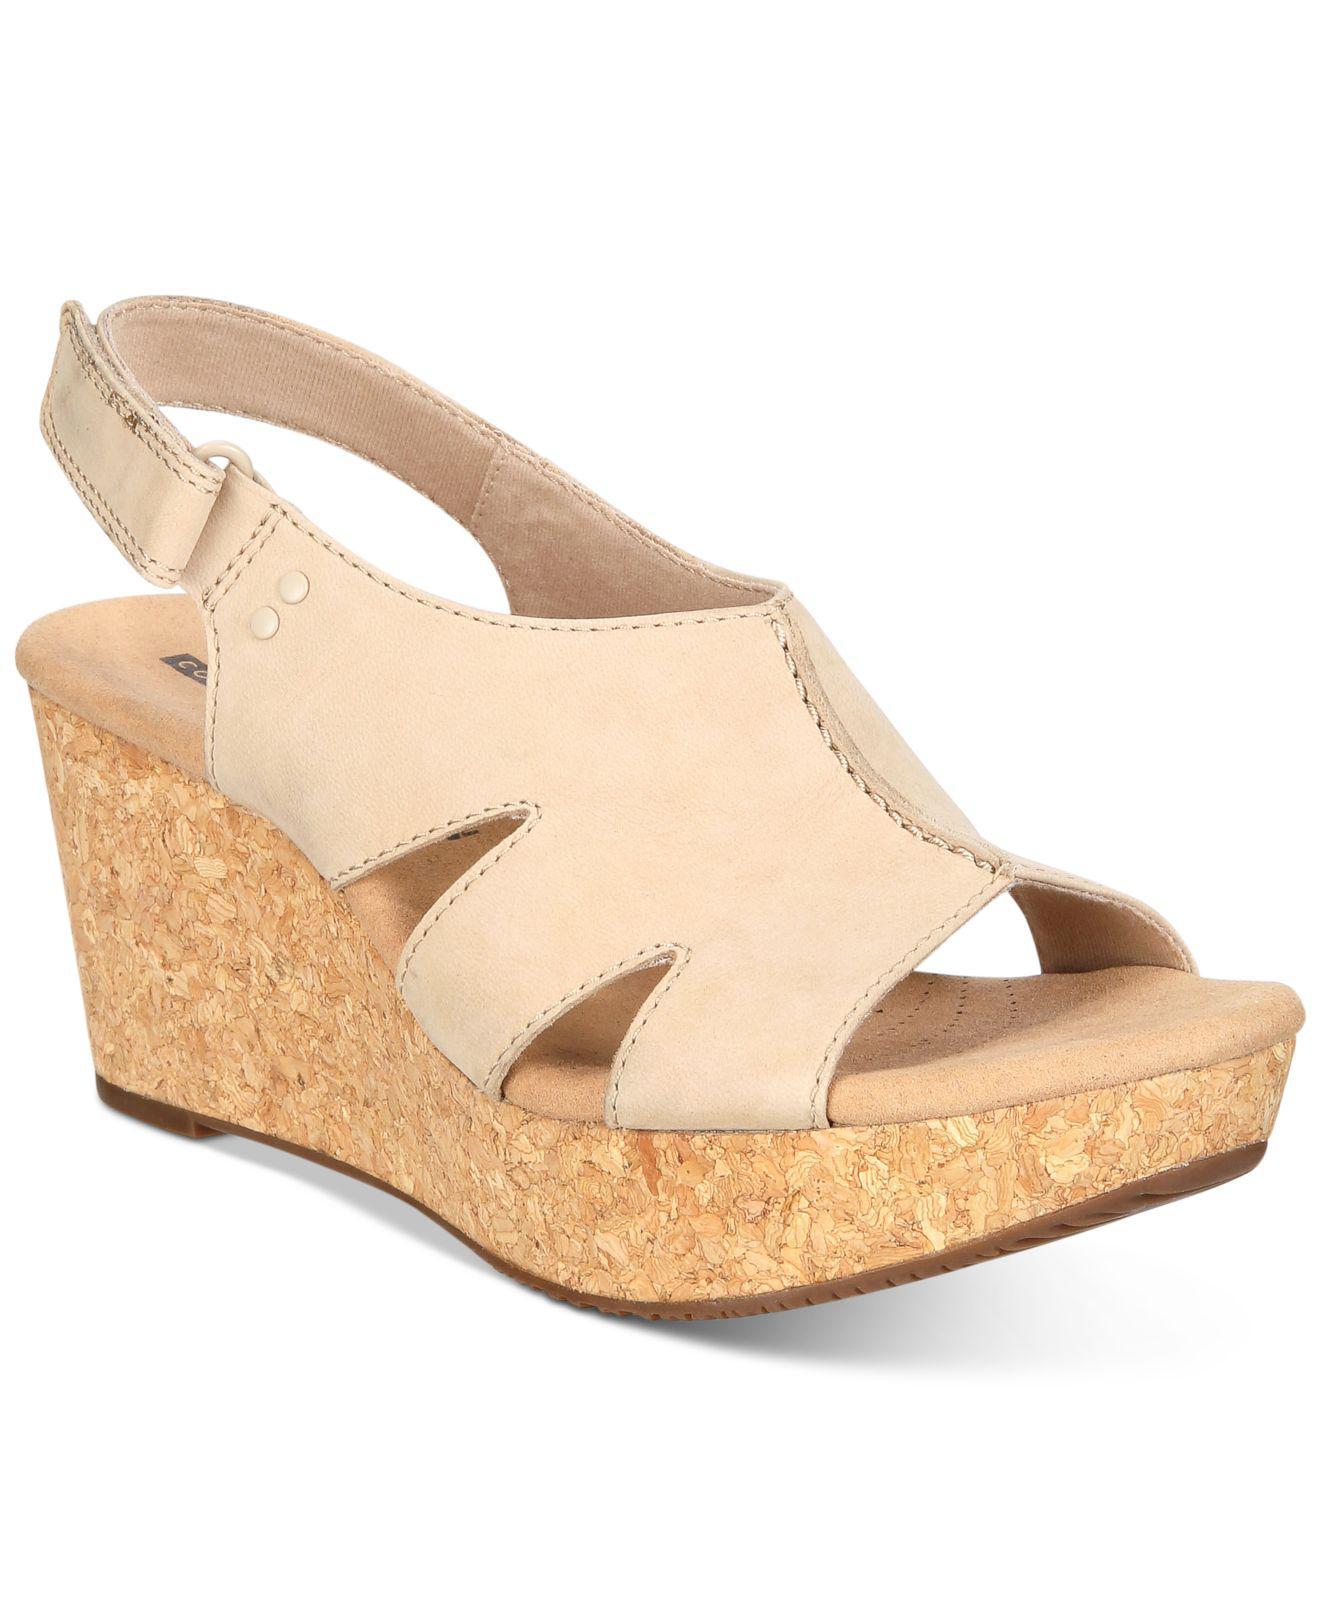 9f26cc276623 Lyst - Clarks Women s Annadel Bari Wedge Sandals in Natural